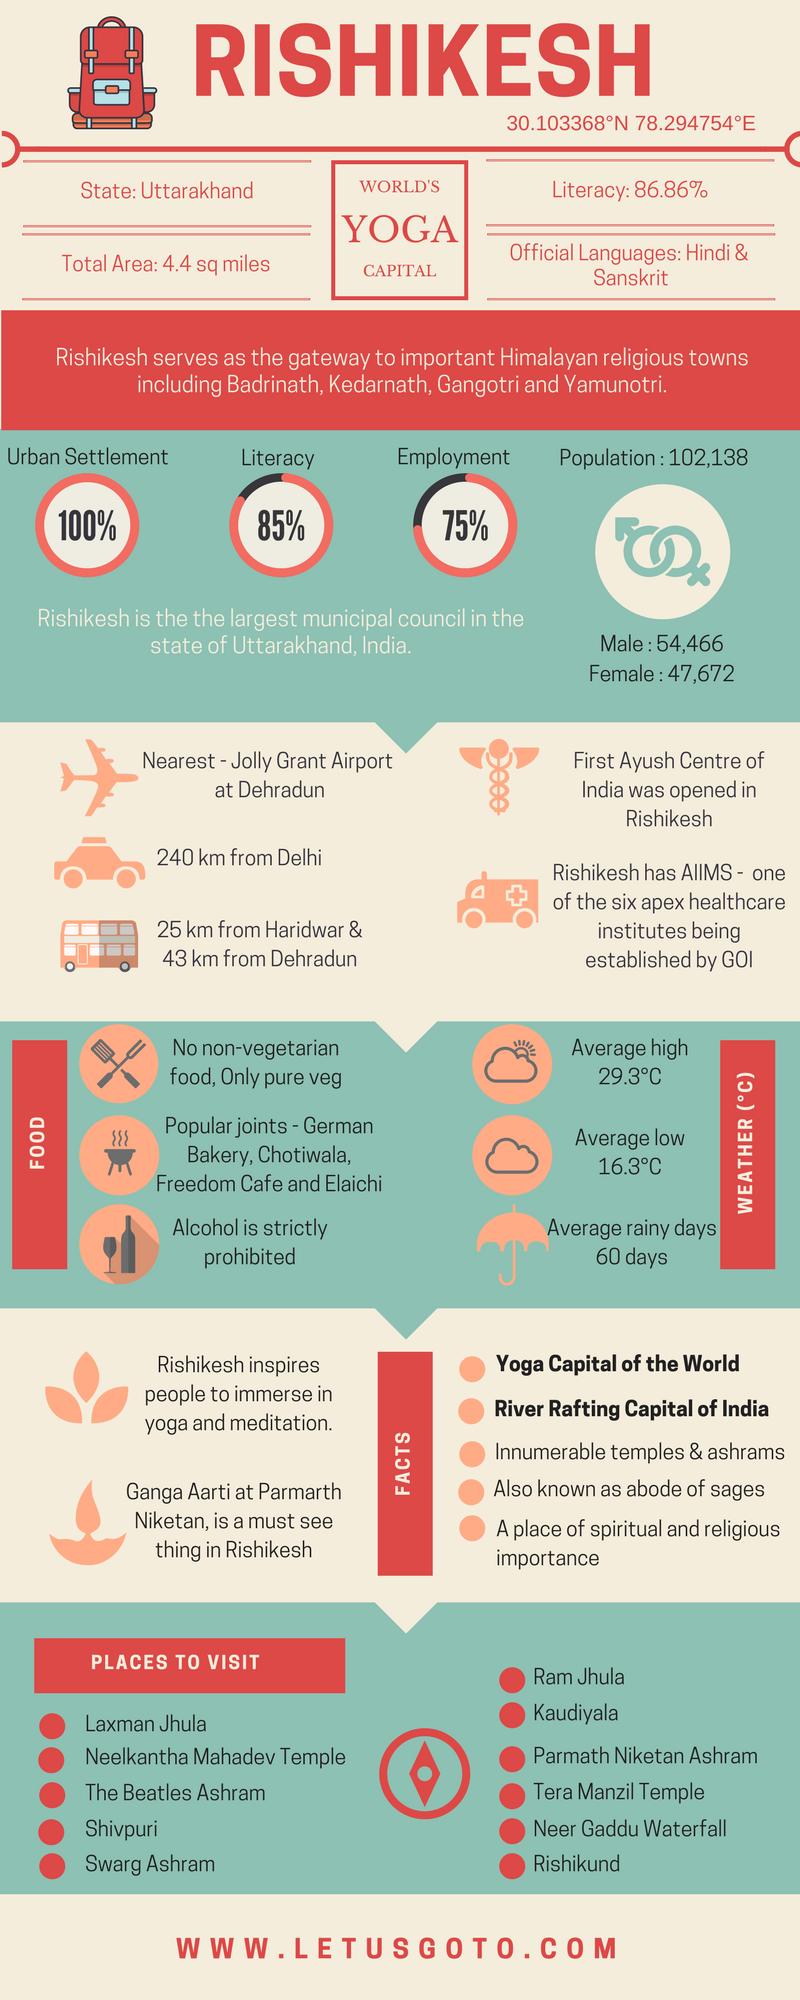 Rishikesh Infographic Letusgoto